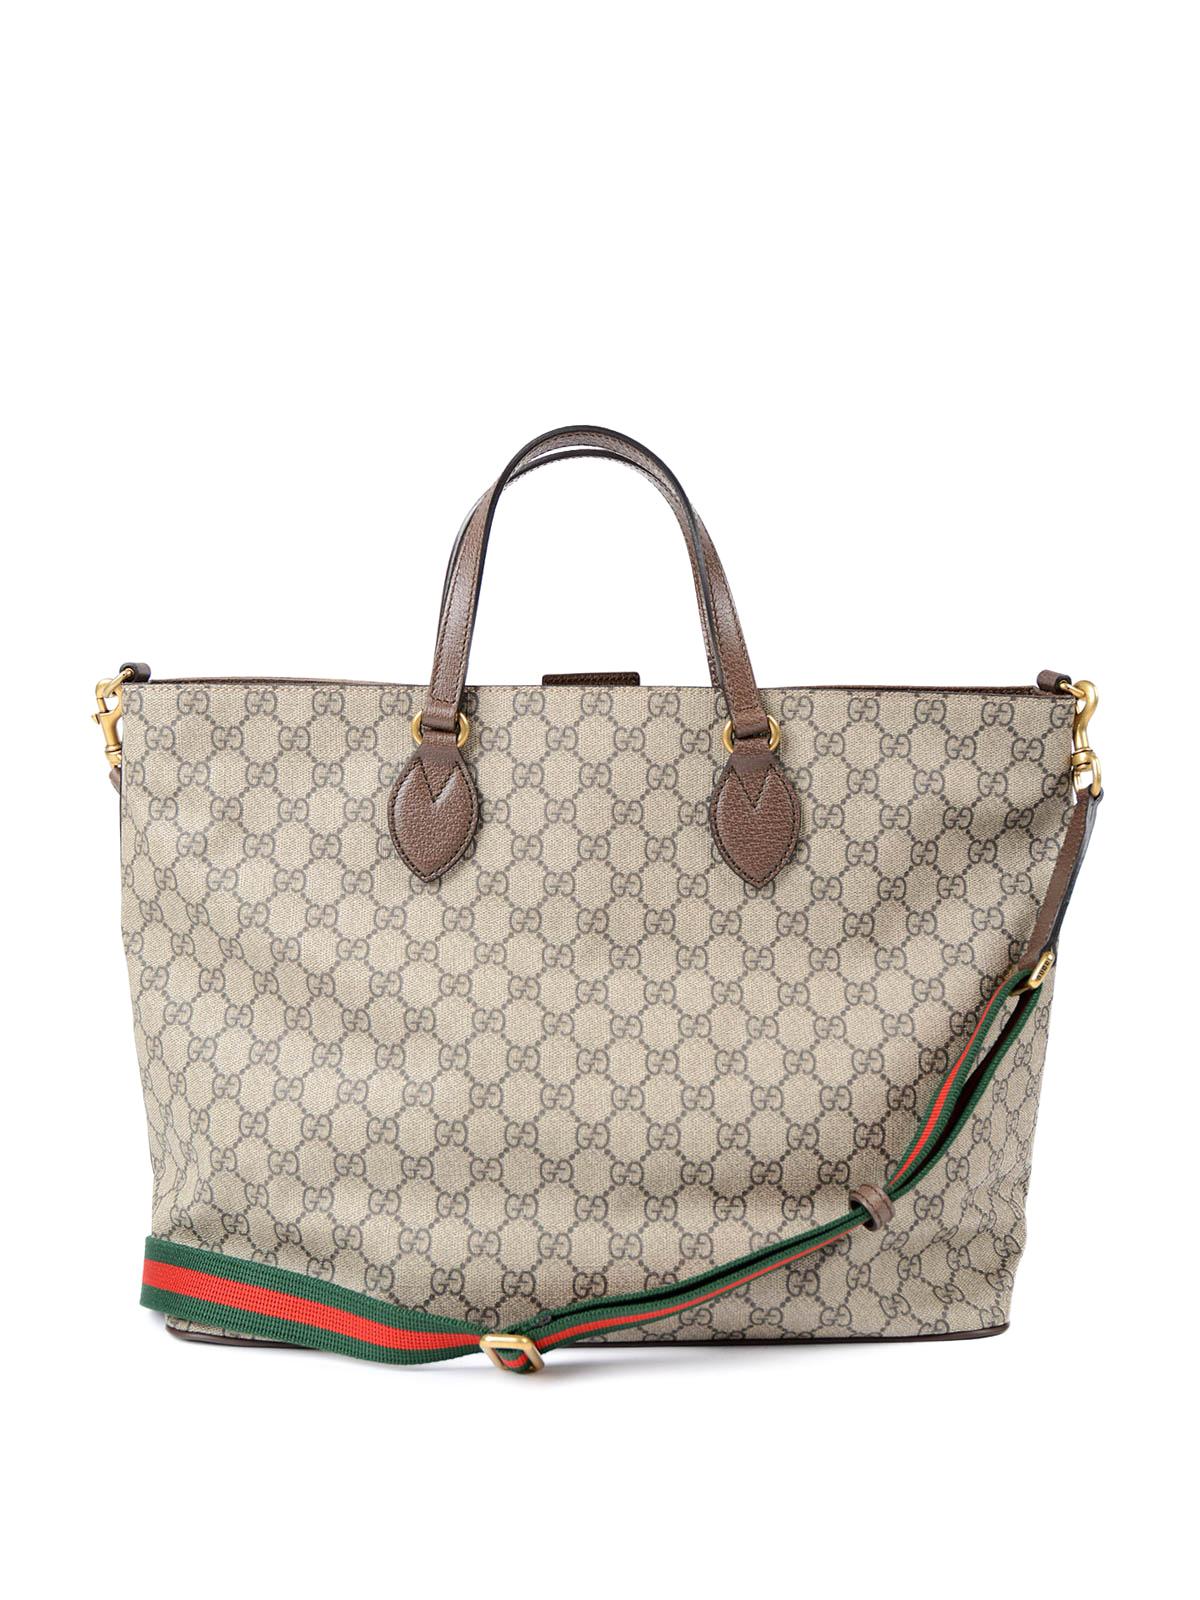 a6e281b1bf24 Gucci - Courrier GG canvas shopping bag - totes bags - 474085 K9RNT 8967